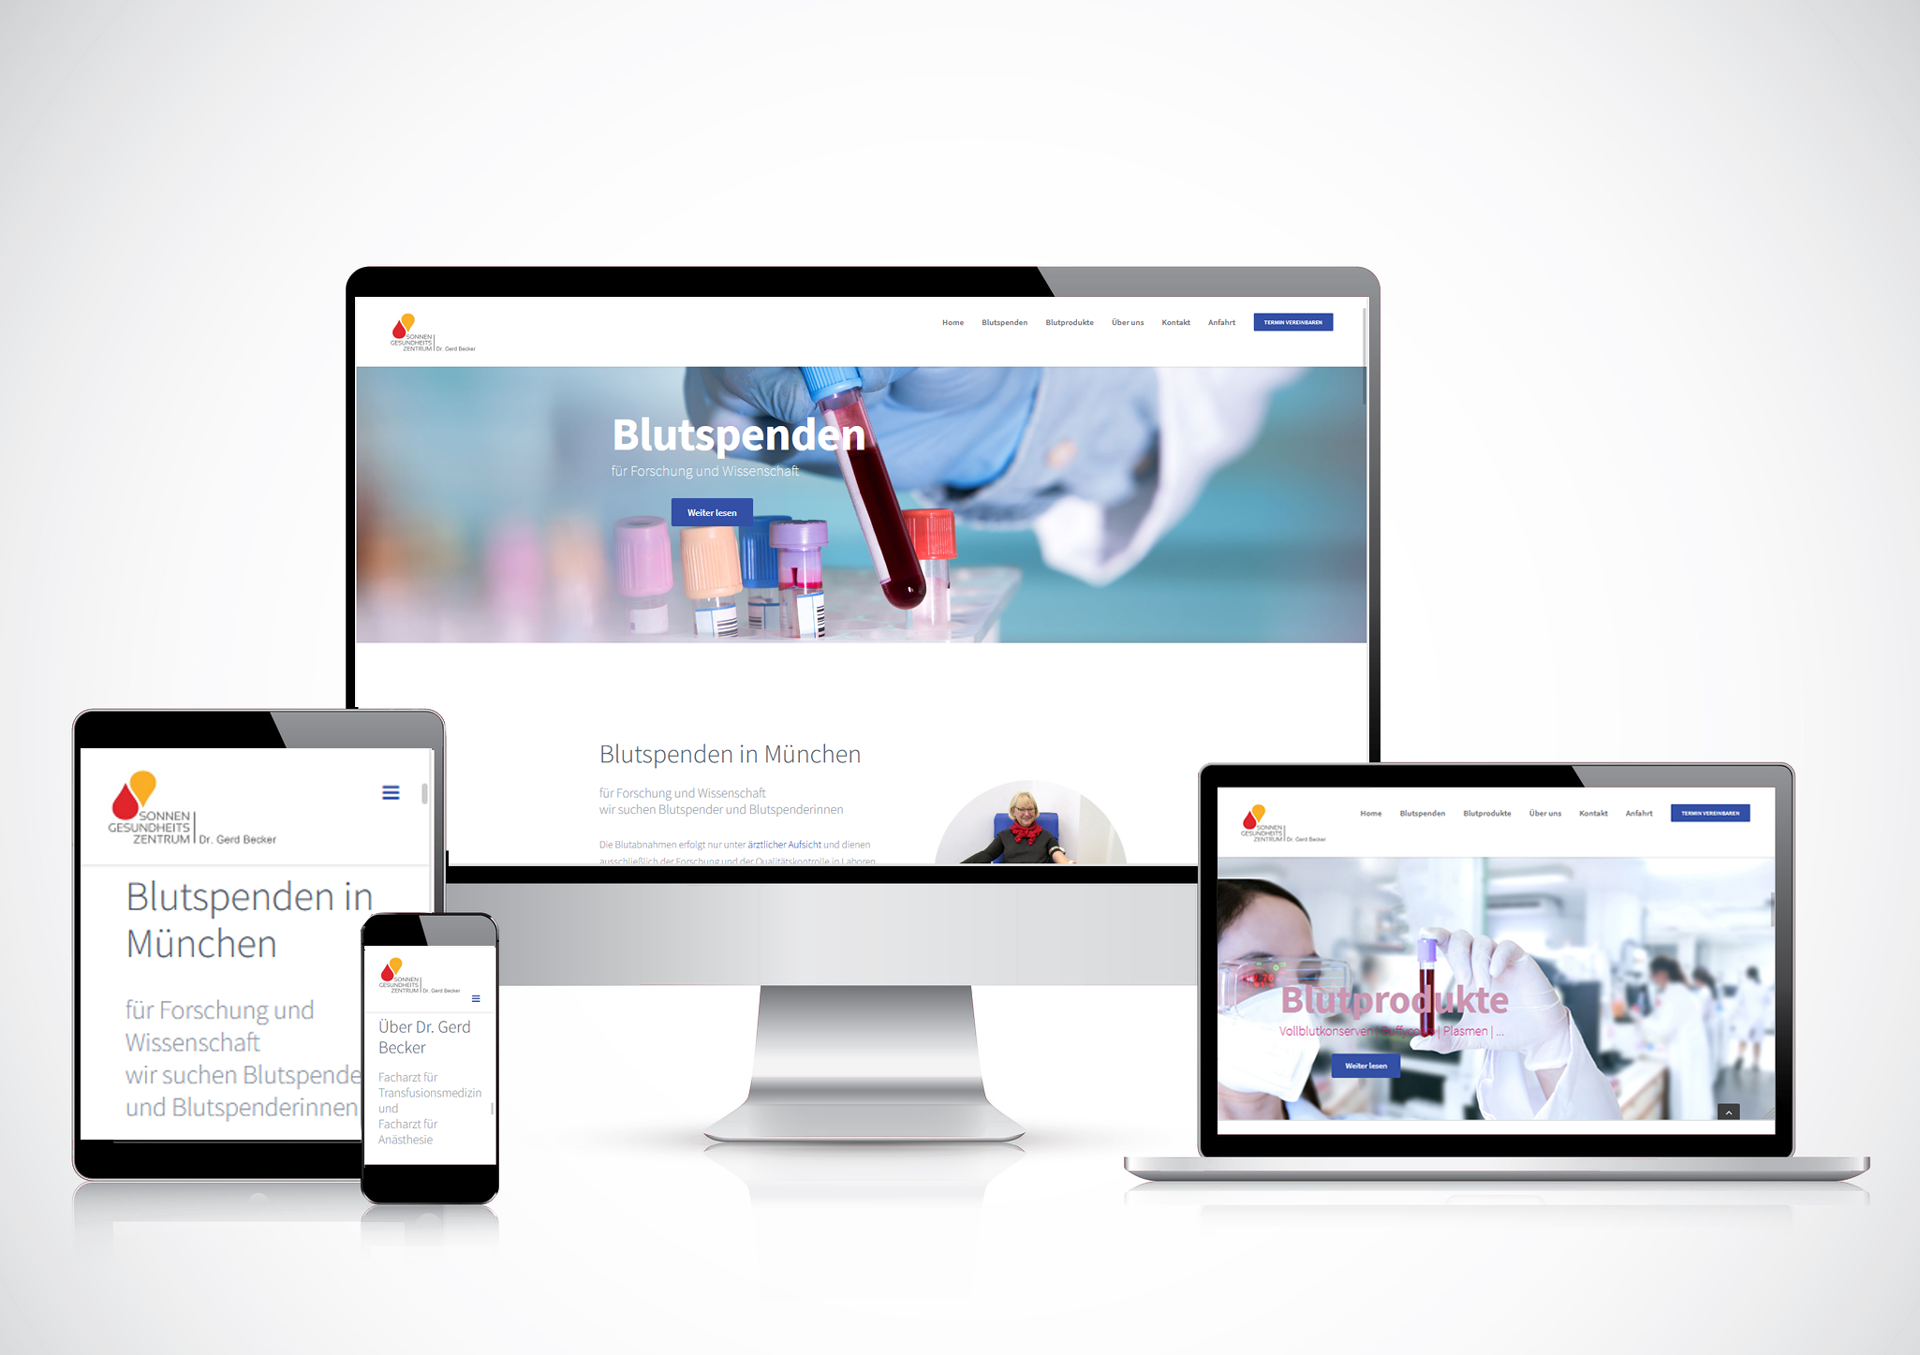 Website: Blutspenden in München, Dr. Gerd Becker